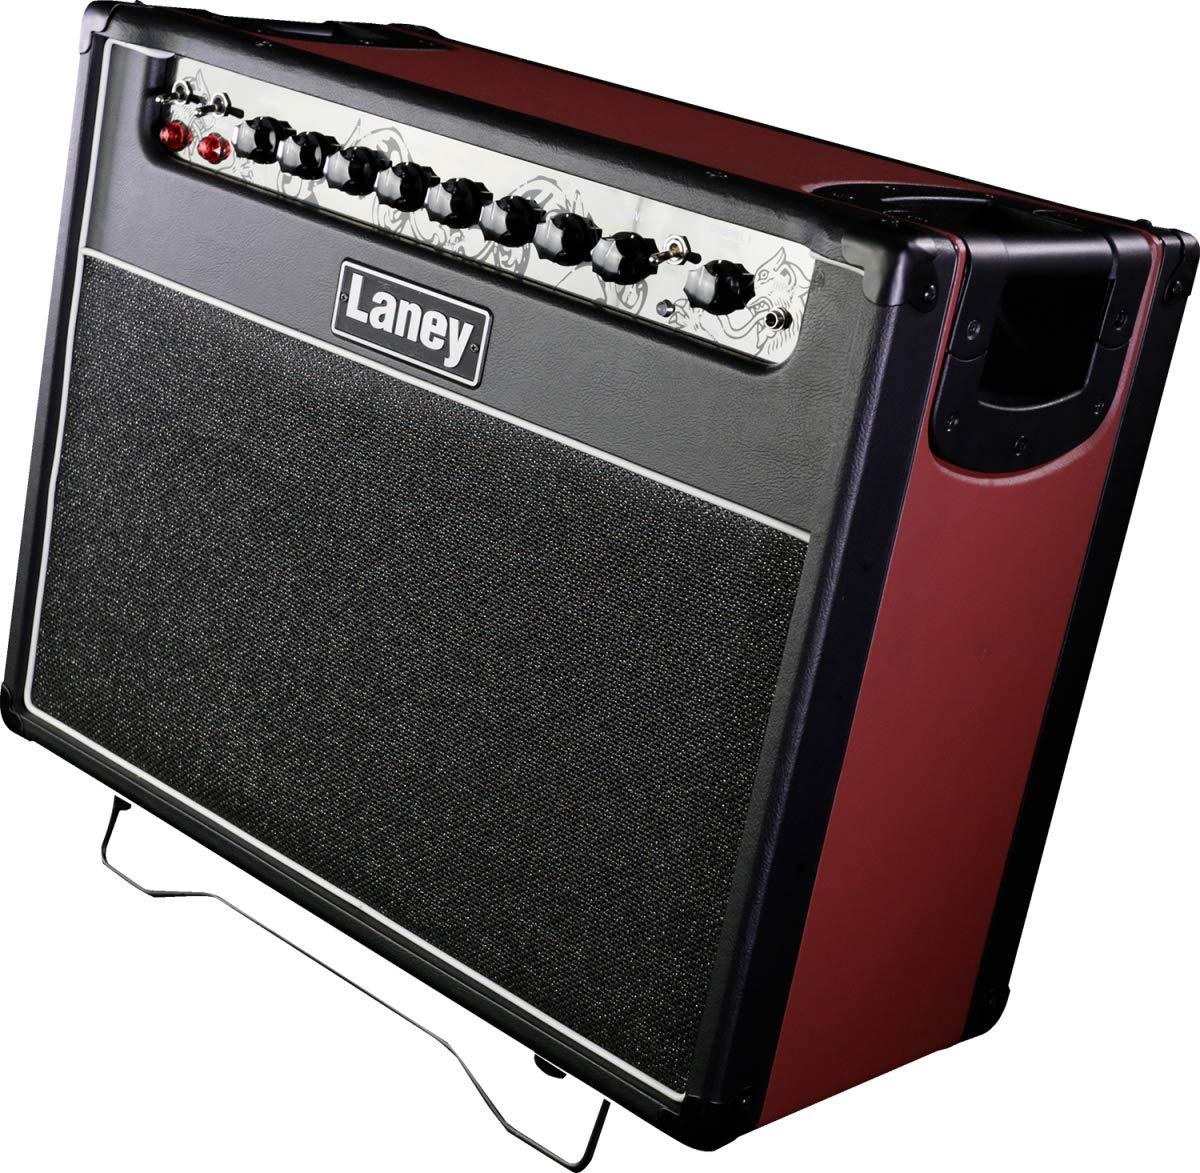 Laney (レイニー) 30W 12インチ ギターコンボアンプ GH30R-112   B078TPMY1C